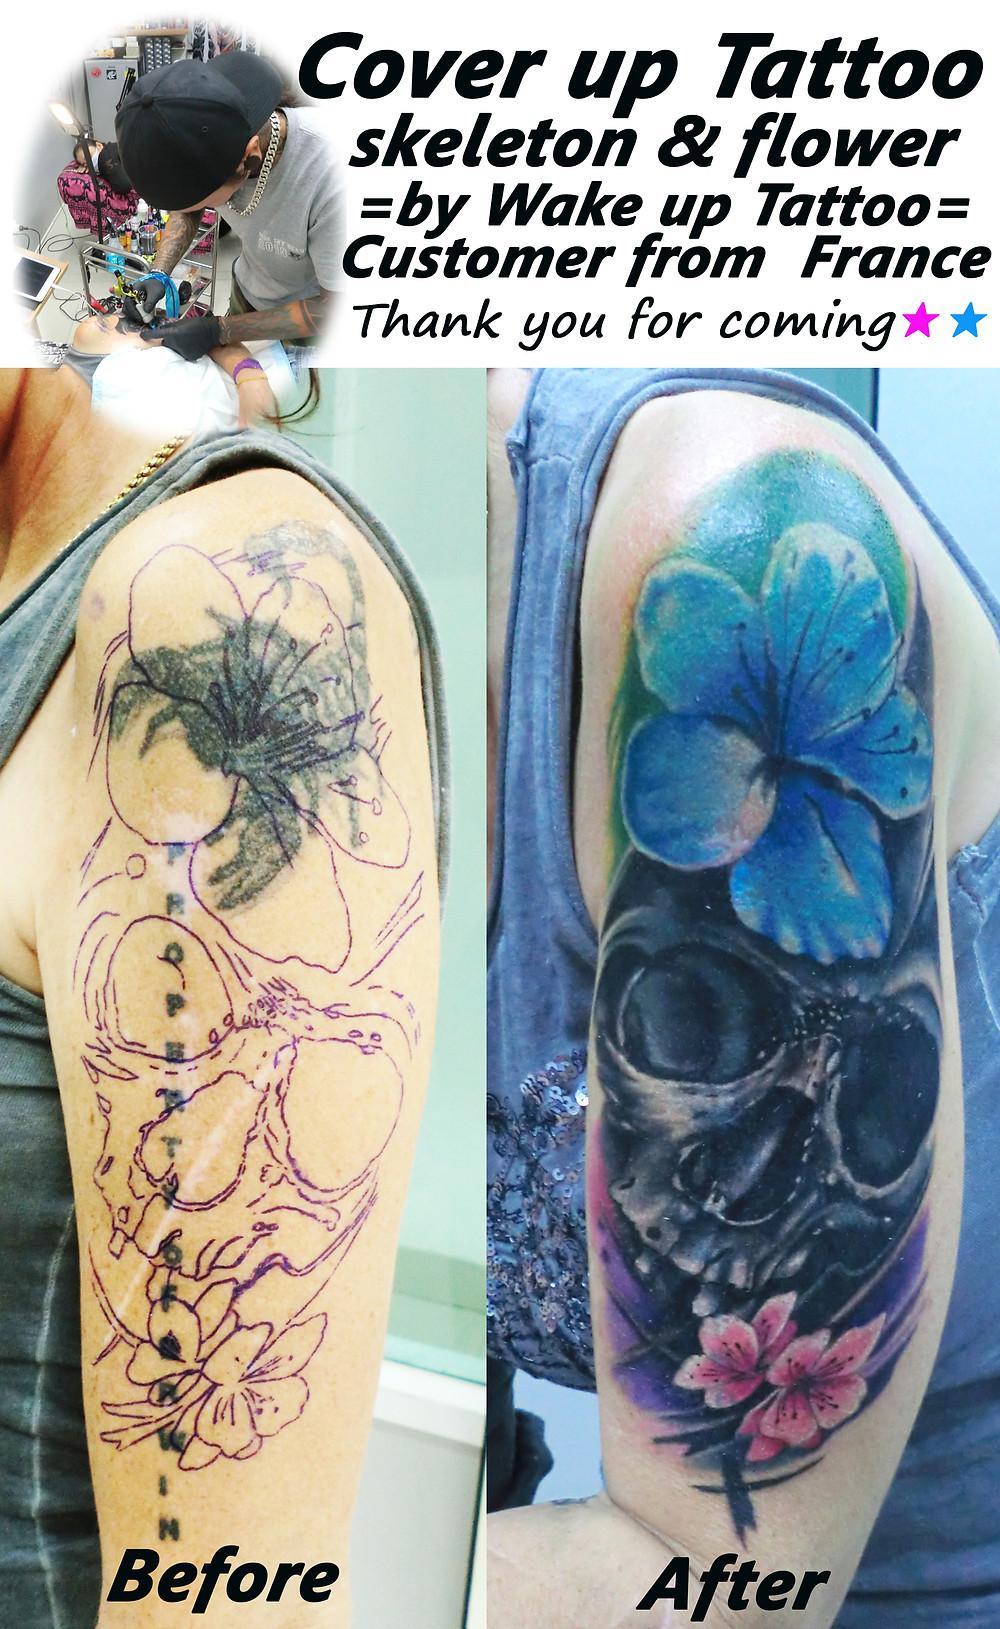 Cover up Tattoo (skeleton & flower) by Wake up Tattoo Phuket